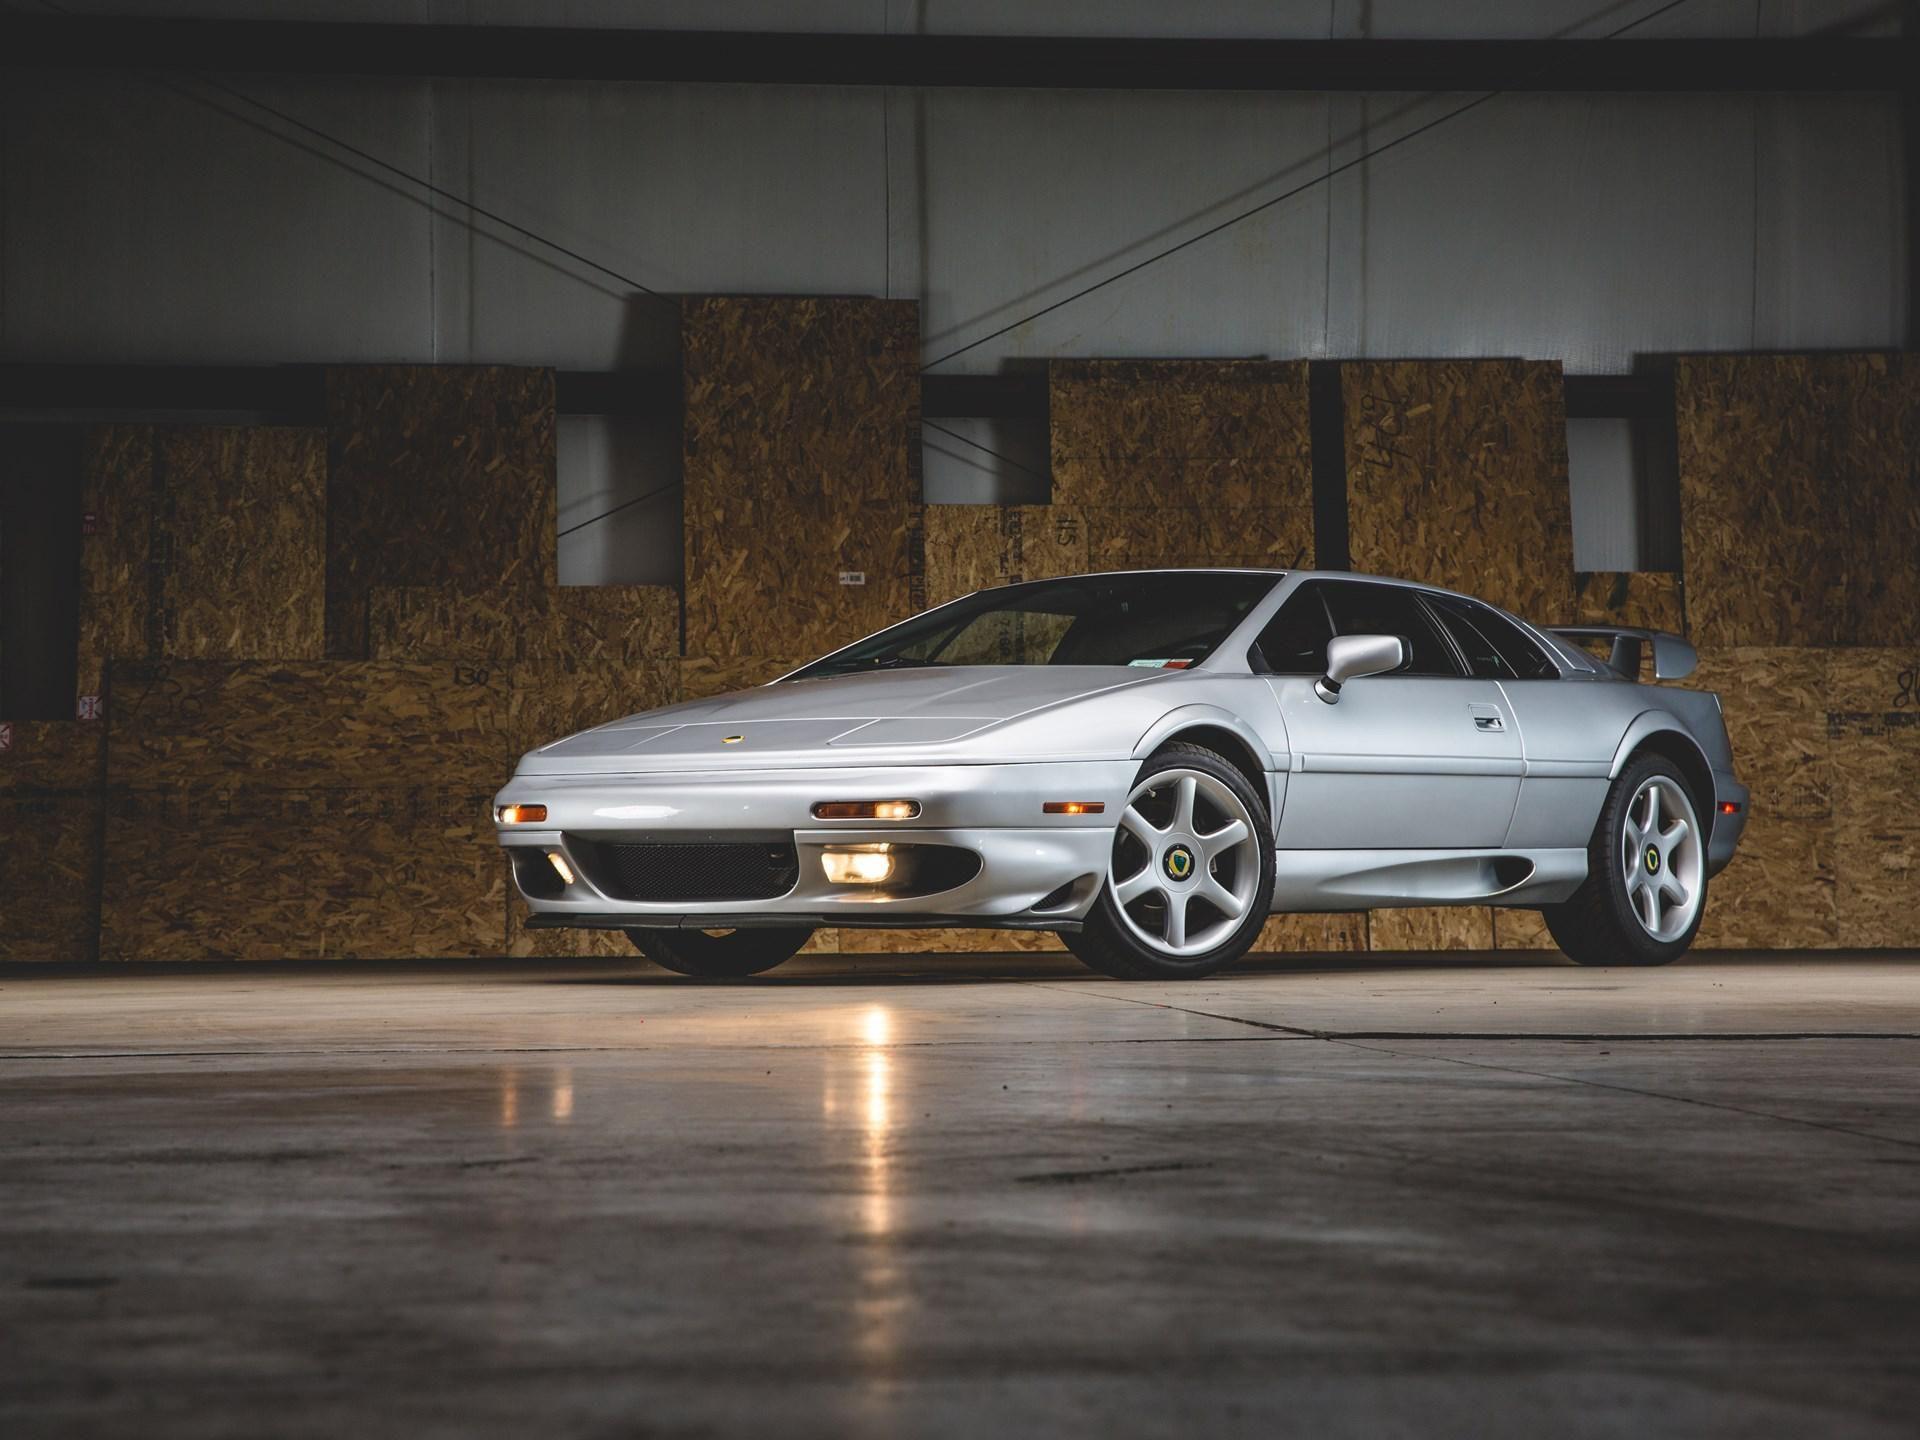 2001 Lotus Esprit V8 SE